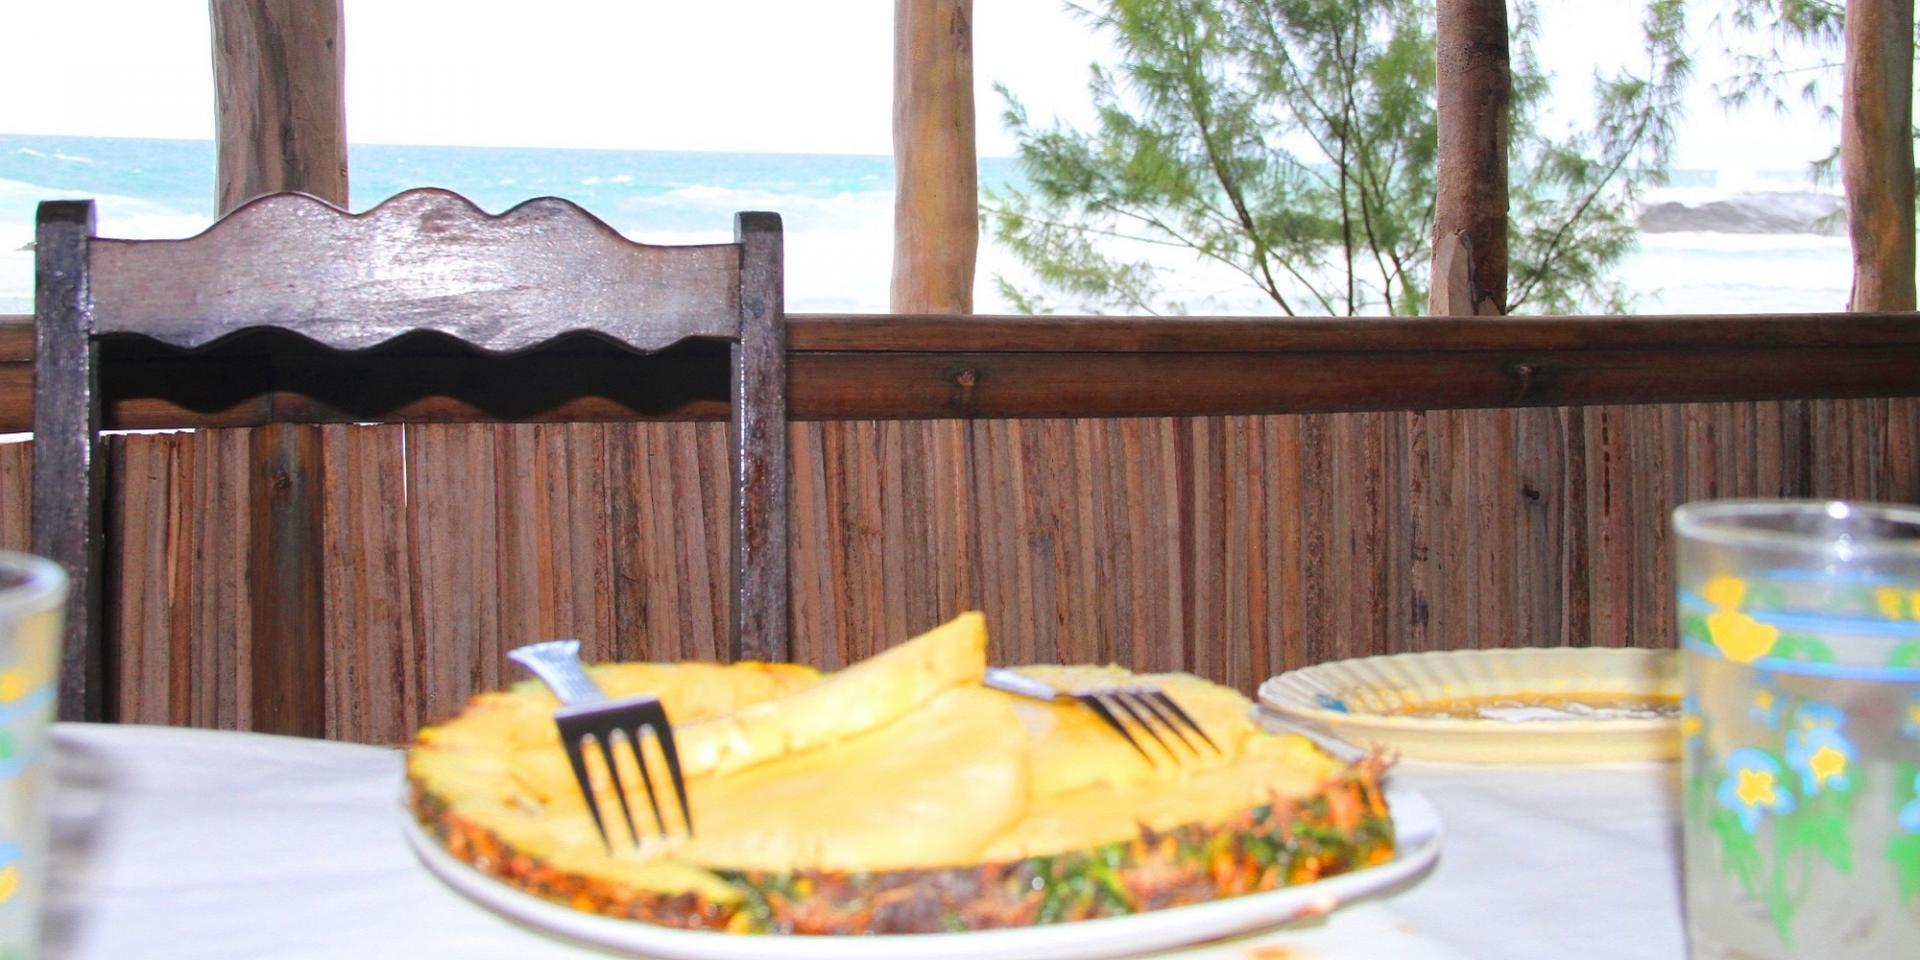 Le cottage restaurant piscines naturelles 2